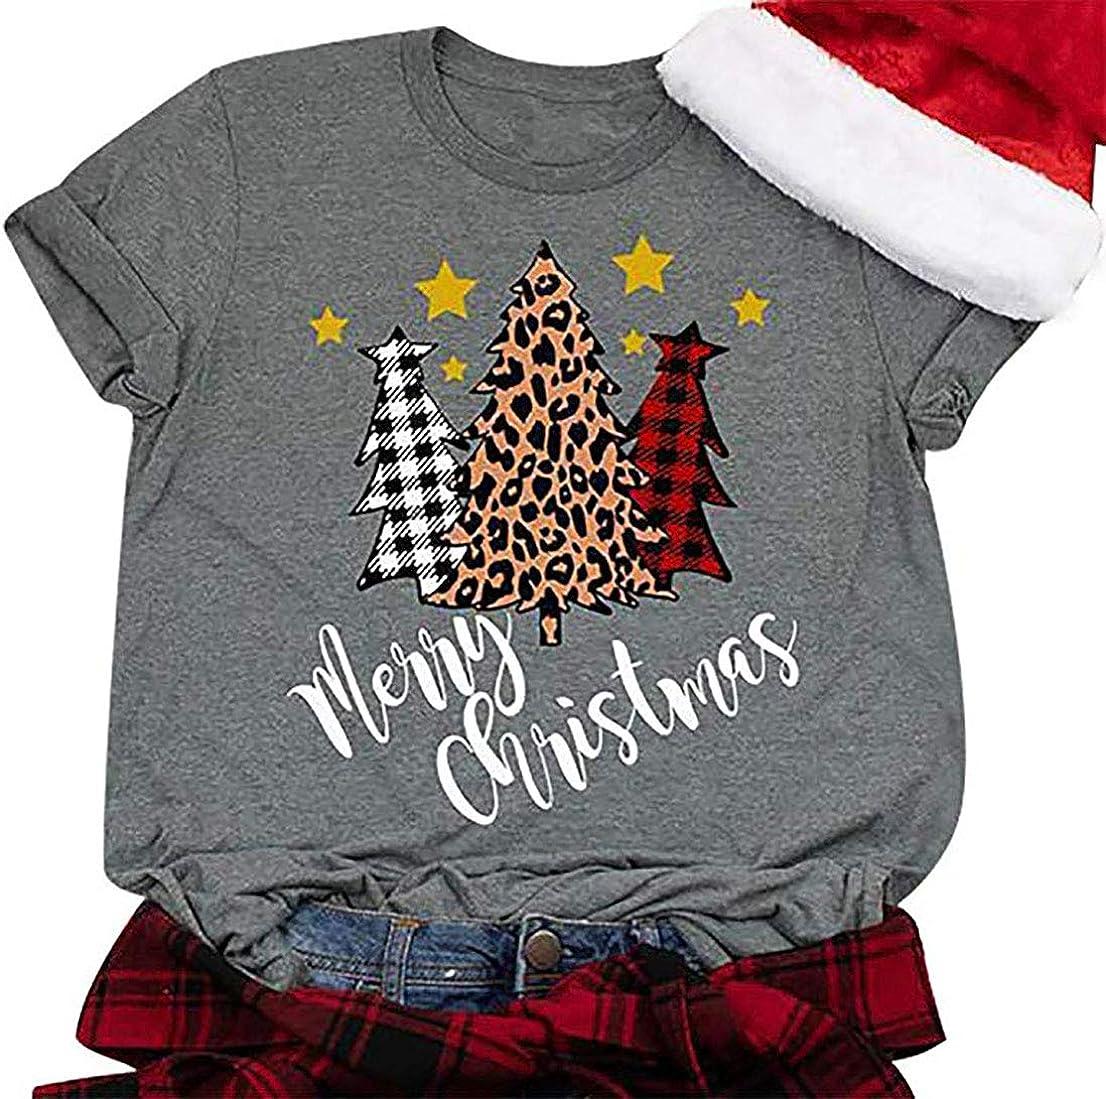 Leopard Print Christmas Shirt Long Sleeve Christmas Tree Shirt Merry Christmas Shirt